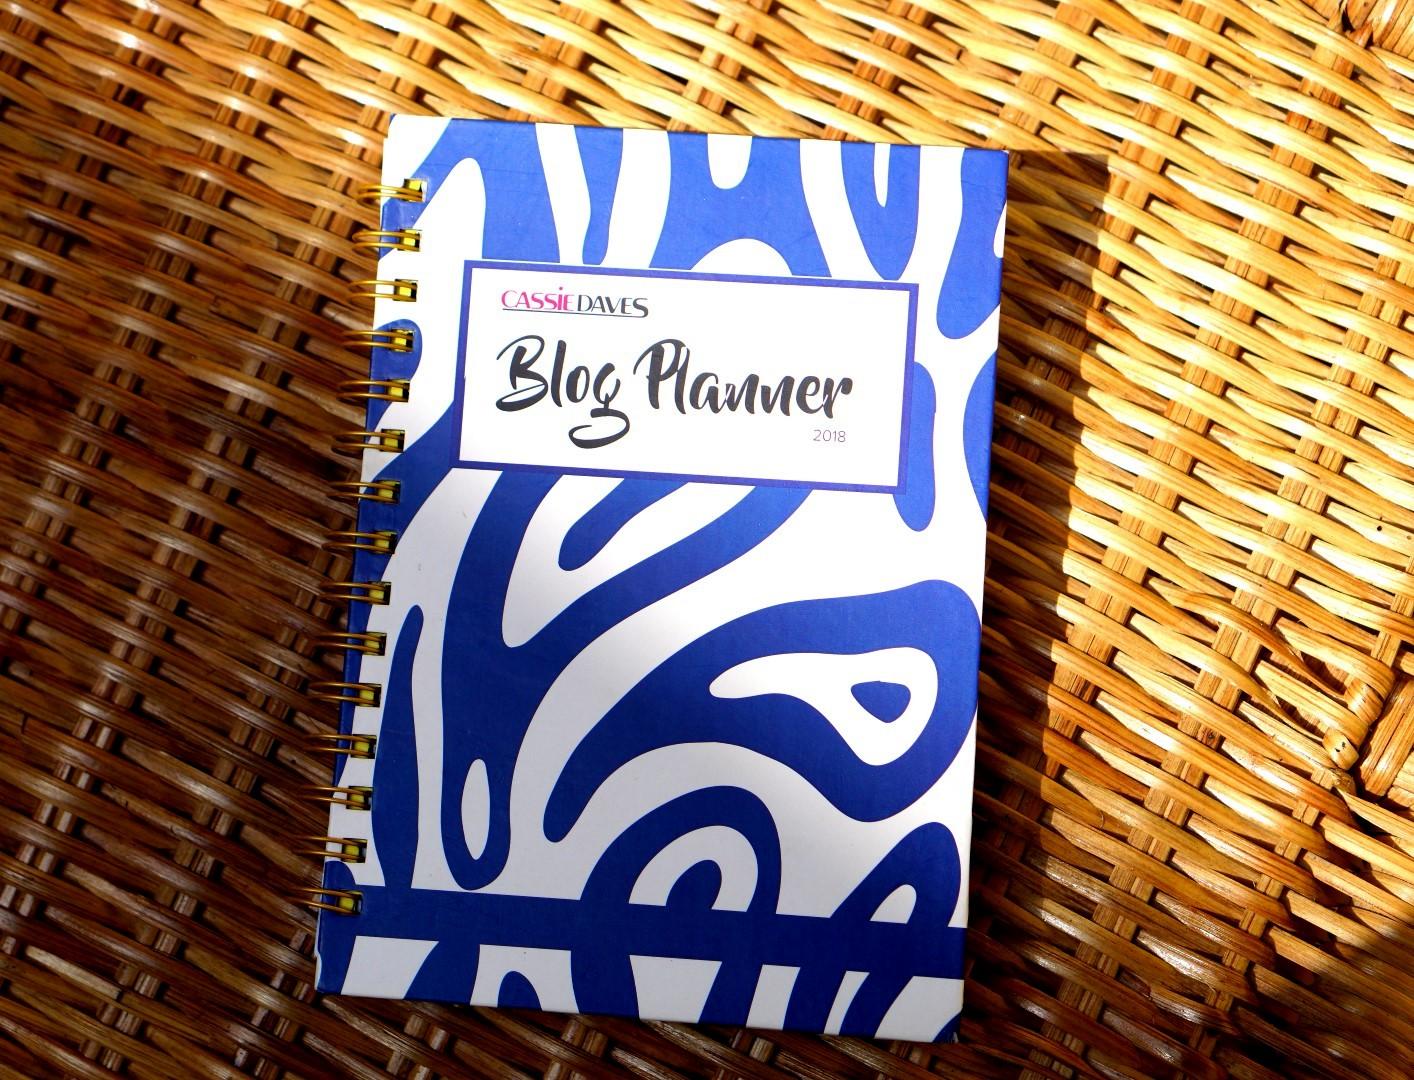 cassie daves planner 2018 blue cover design